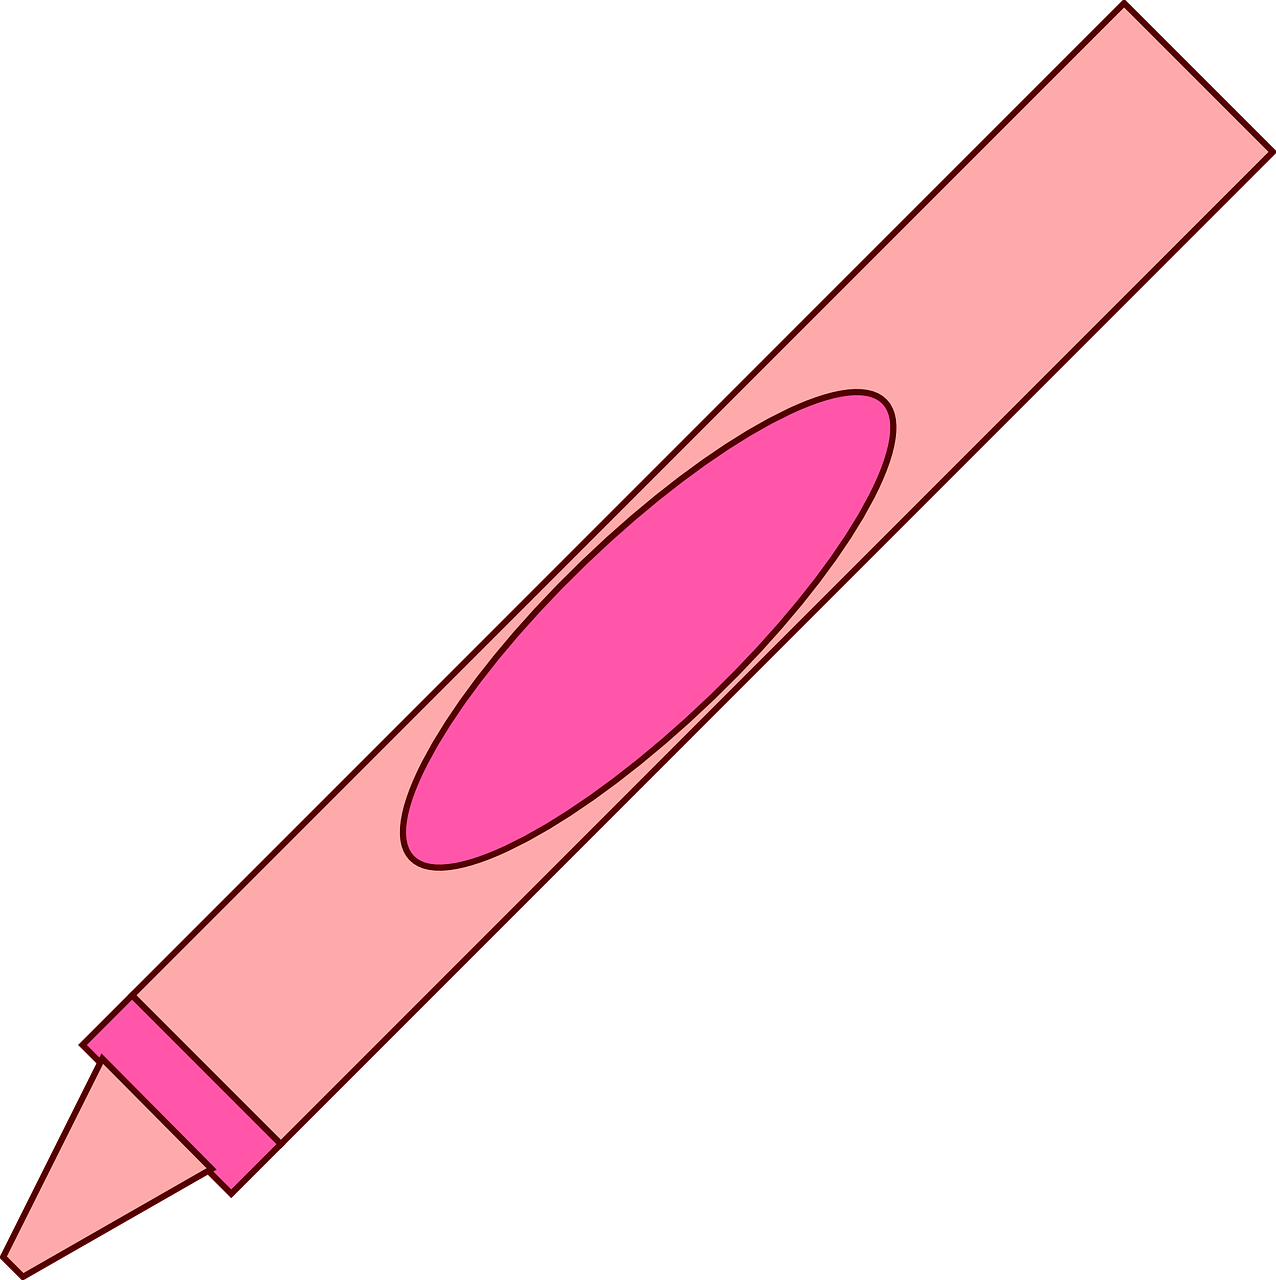 Crayon clipart pink crayon Simple Domain Free Use Crayon